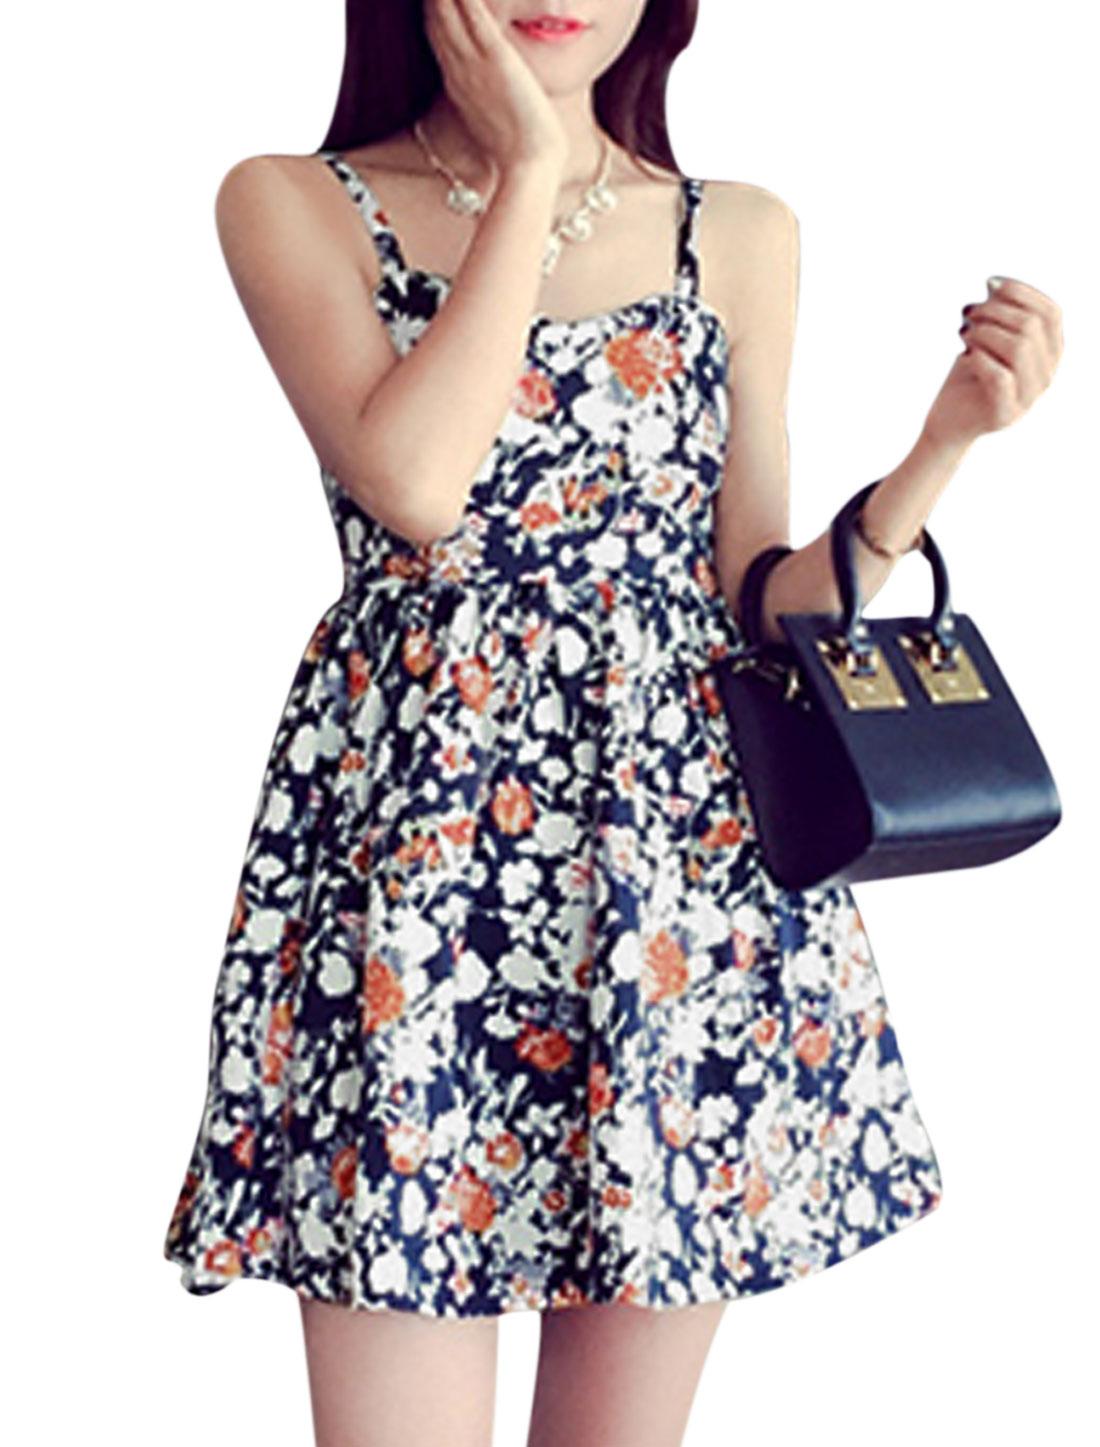 Women Sweetheart Neckline Floral Prints Skater Dress Black XS